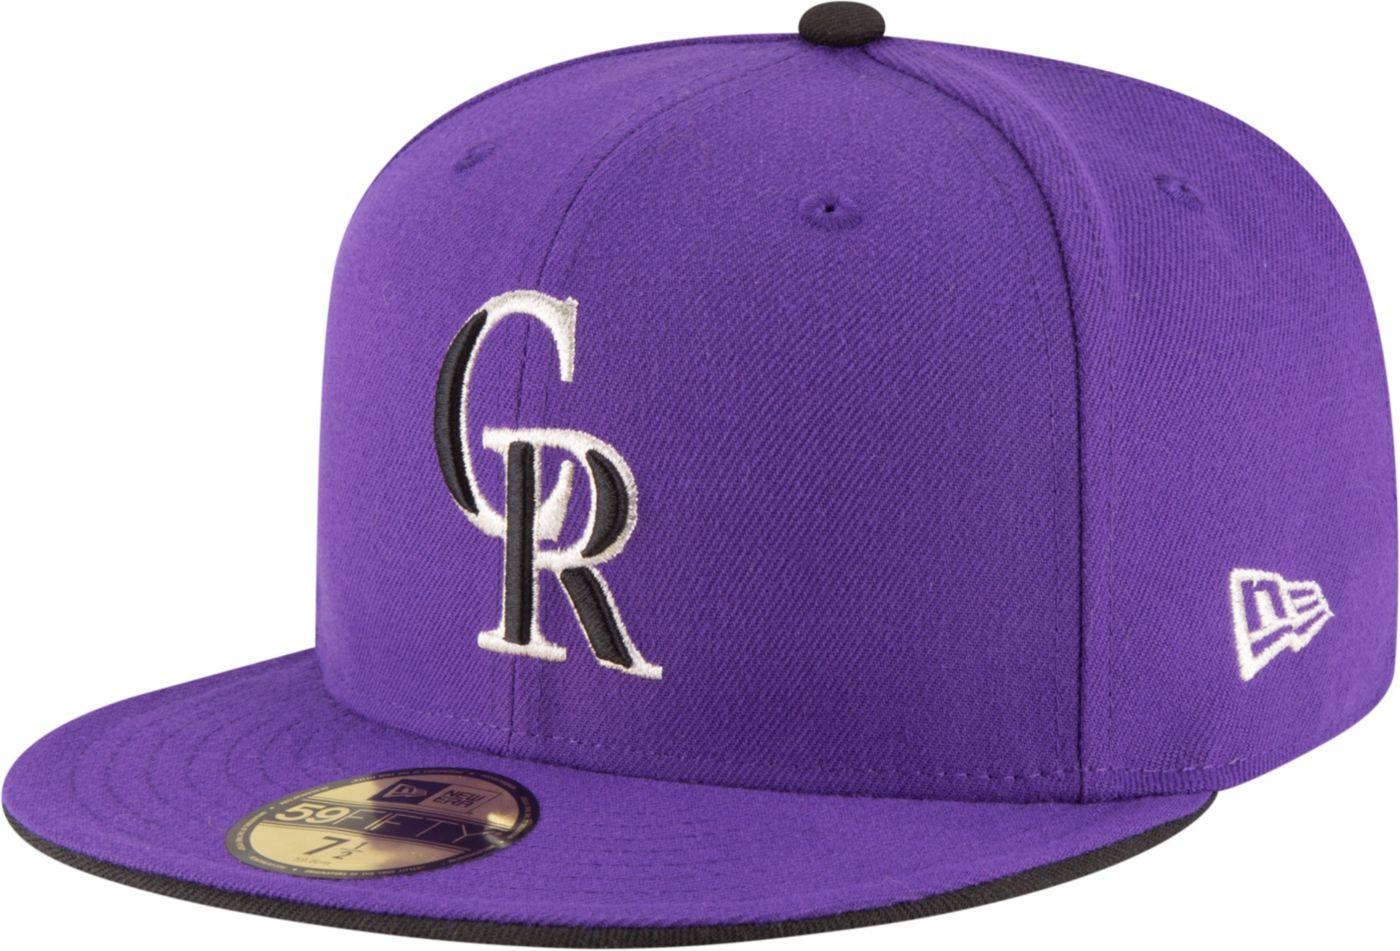 New Era Men's Colorado Rockies 59Fifty Alternate Purple Authentic Hat